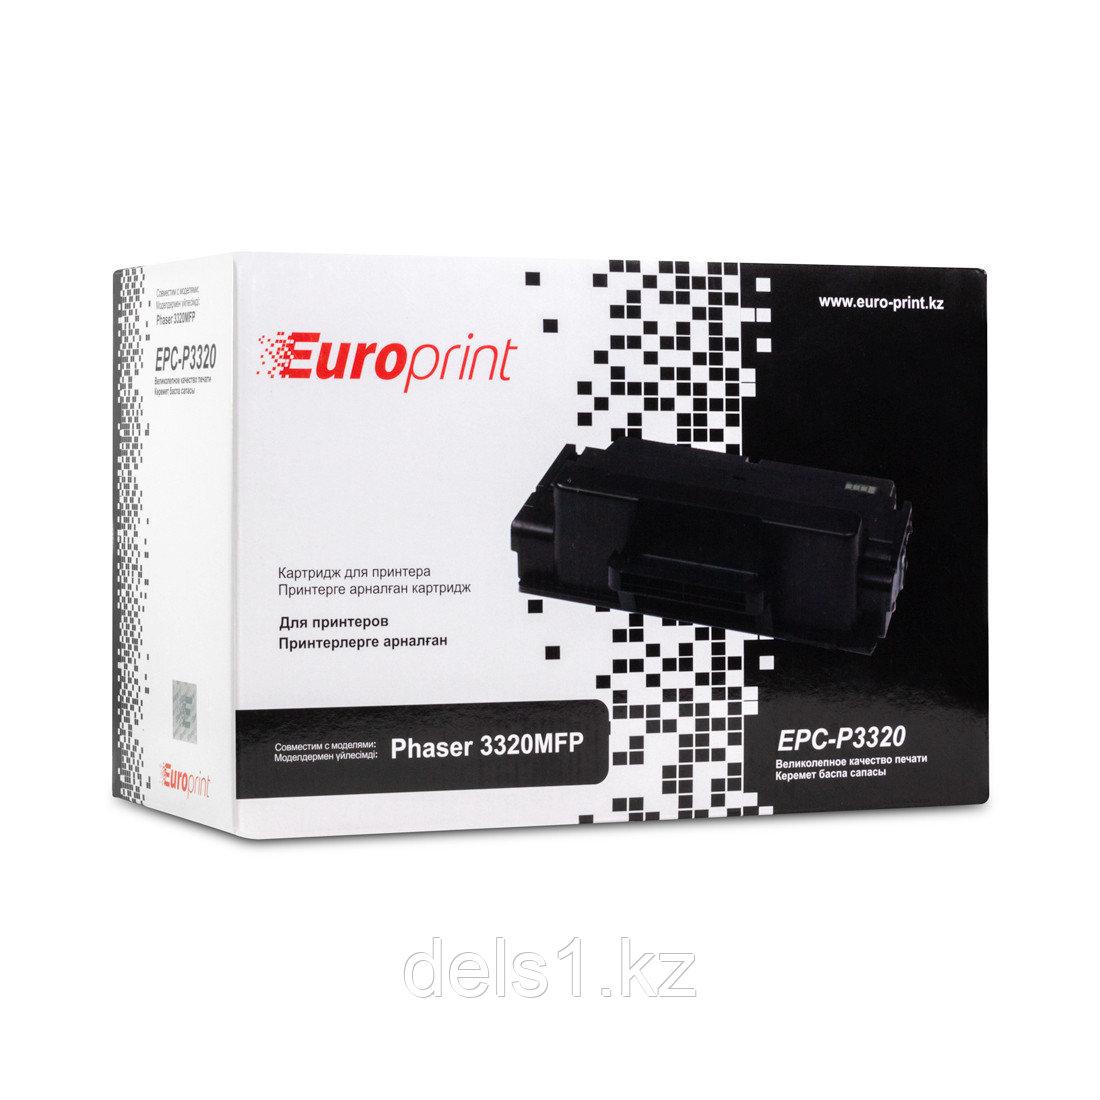 Картридж, Europrint, EPC-P3320, Для принтеров Xerox Phaser 3320MFP, 11000 страниц.